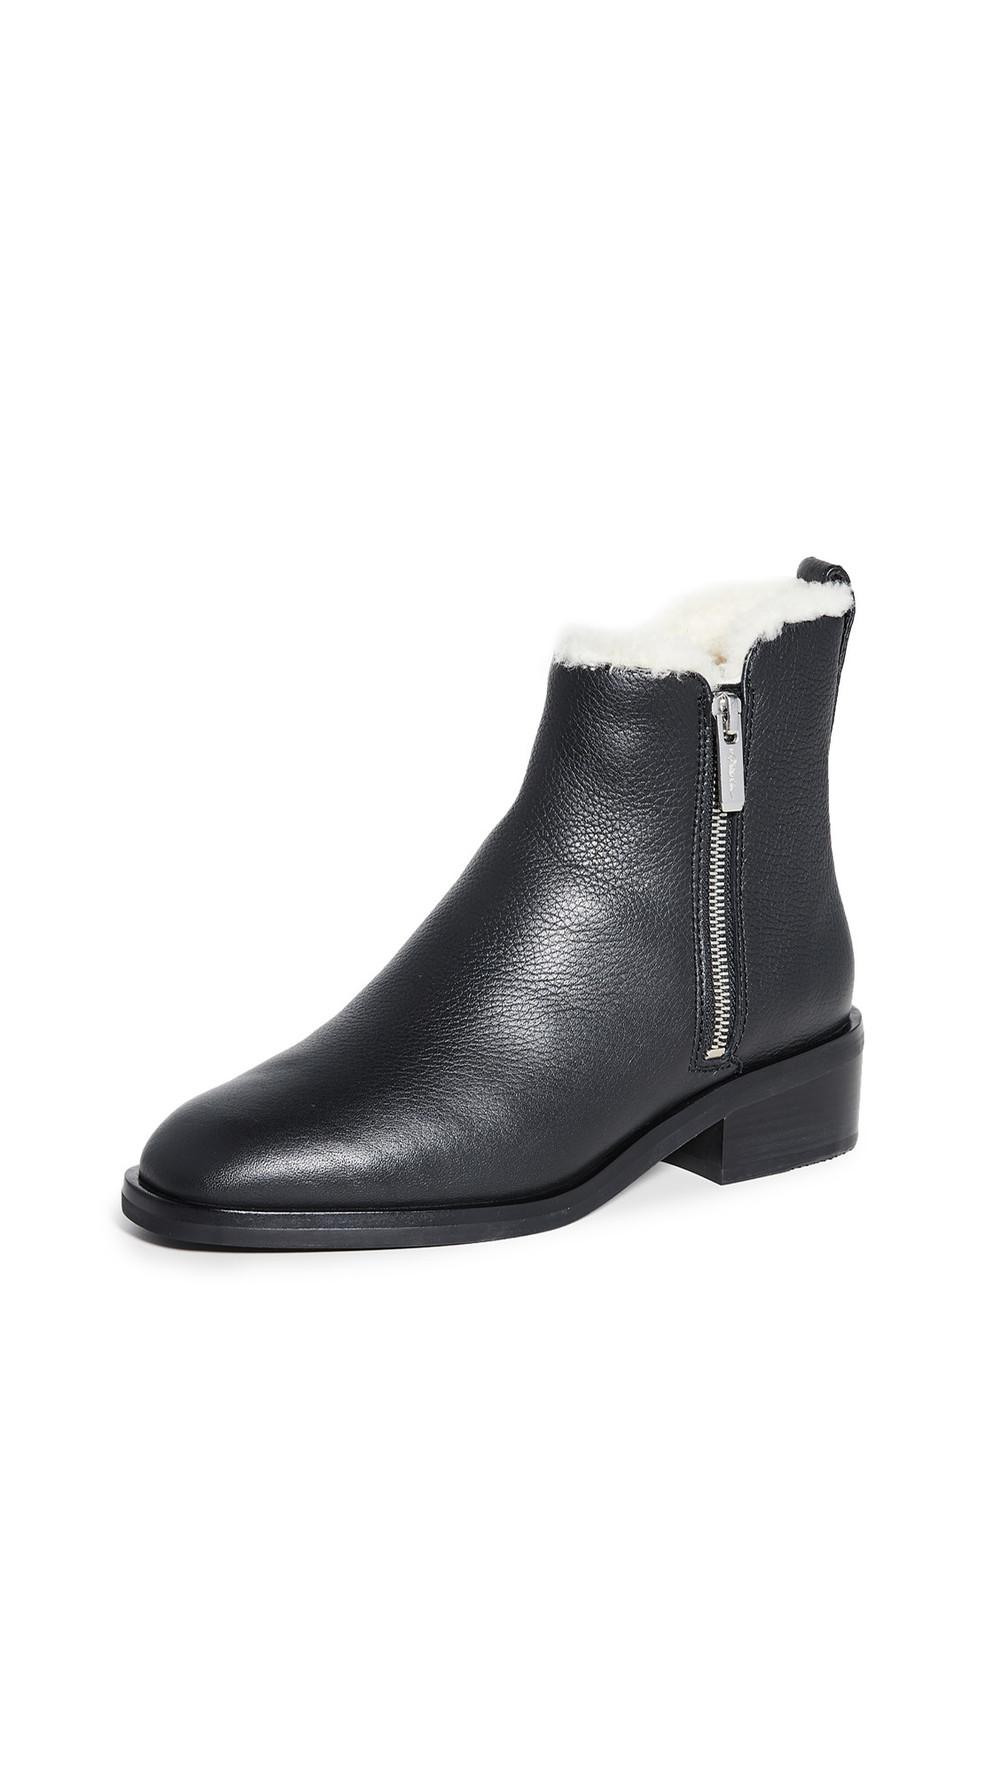 3.1 Phillip Lim 40mm Alexa Shearling Boots in black